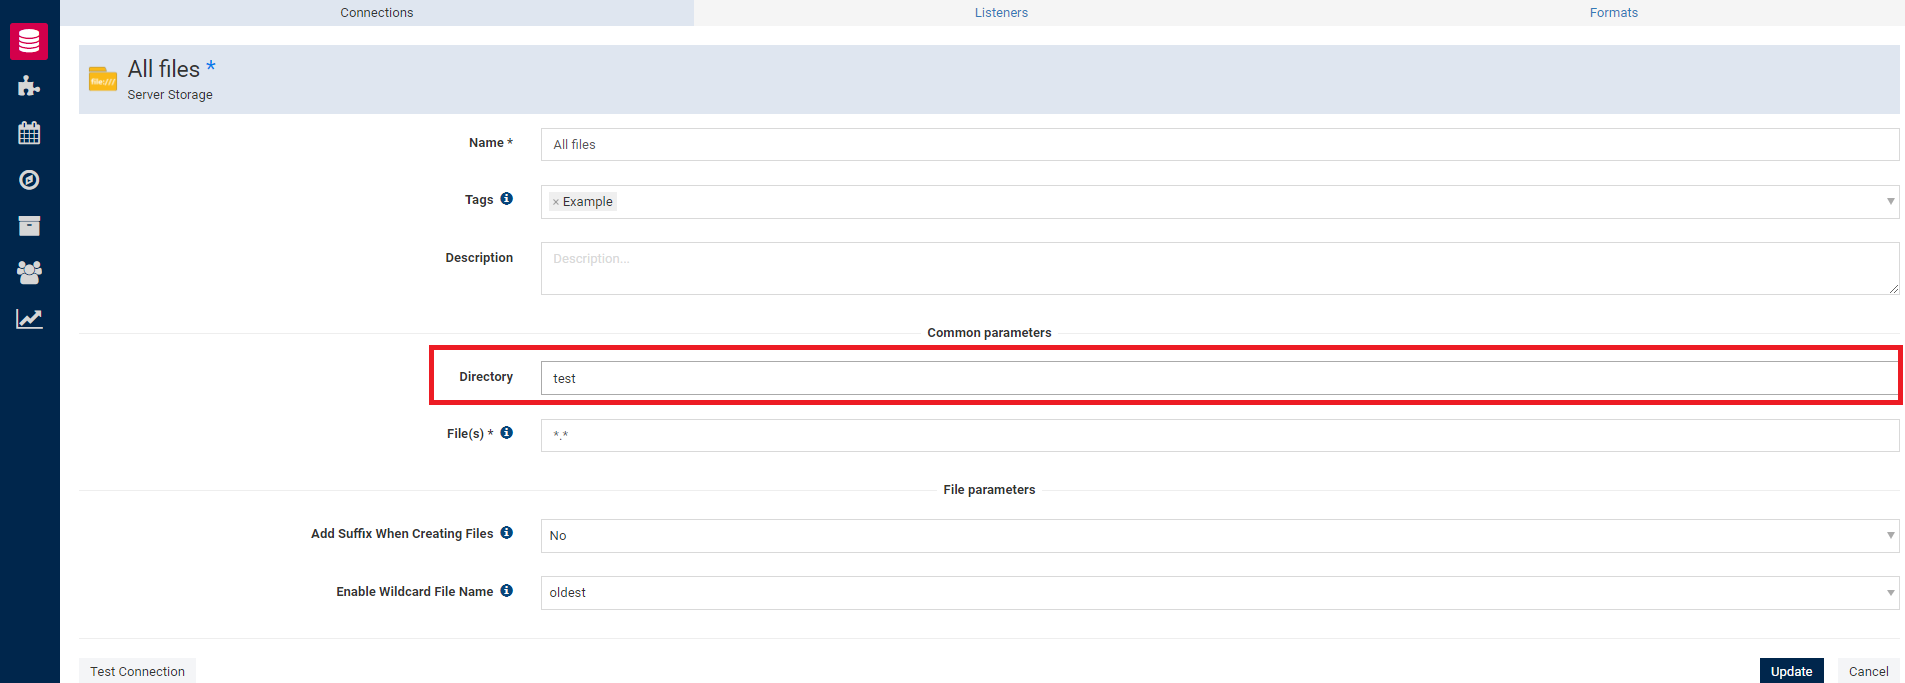 Copy, move, rename, delete, zip, and unzip files – Etlworks Support